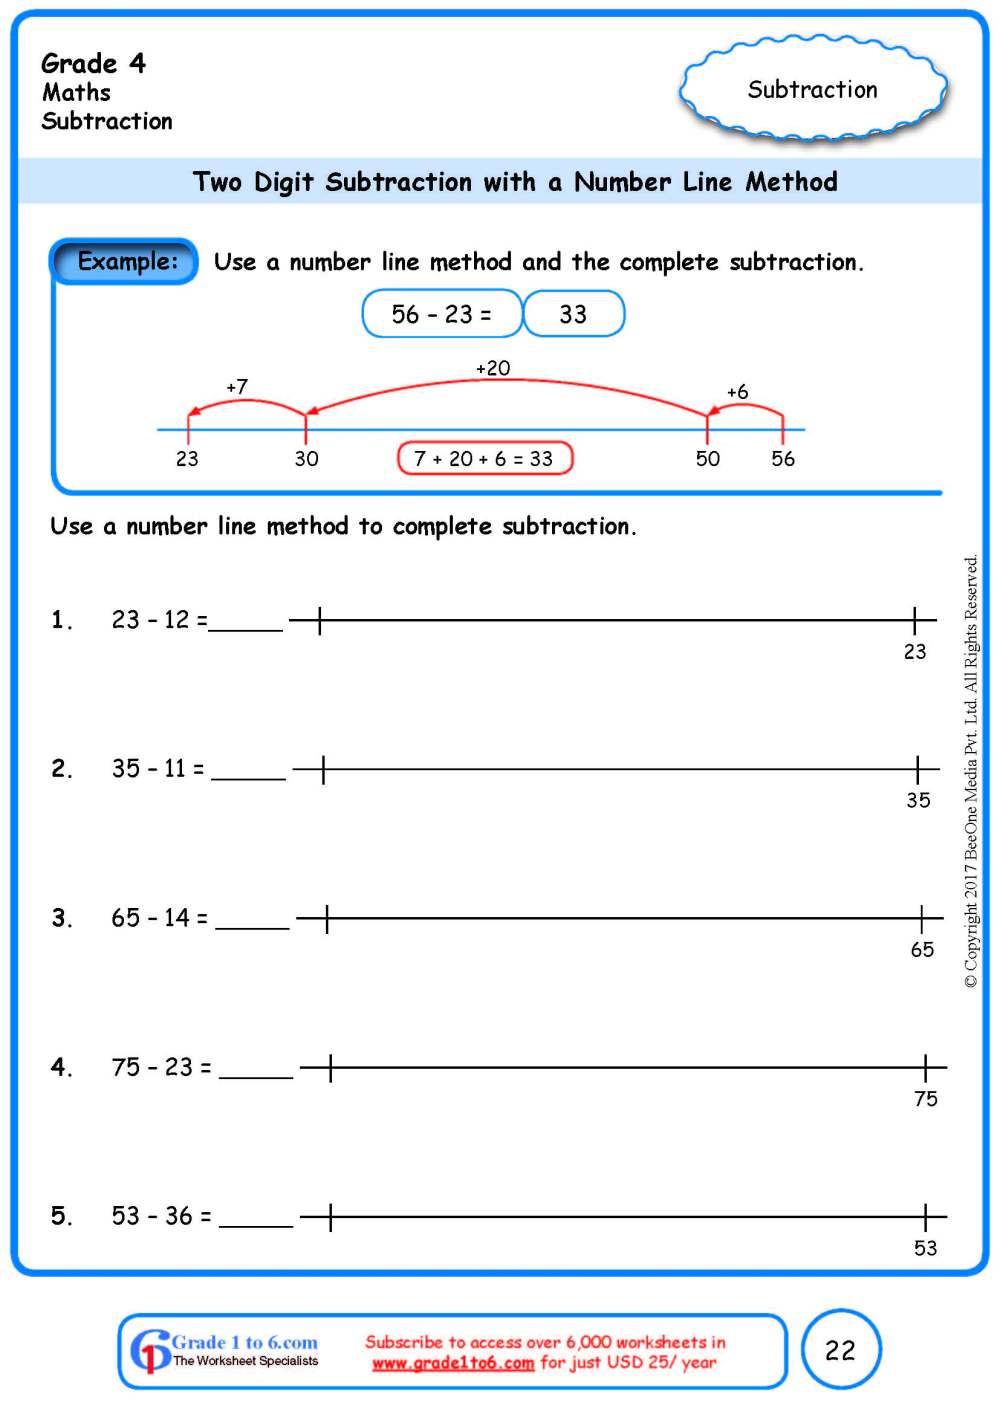 medium resolution of Number Line Subtraction Worksheets www.grade1to6.com